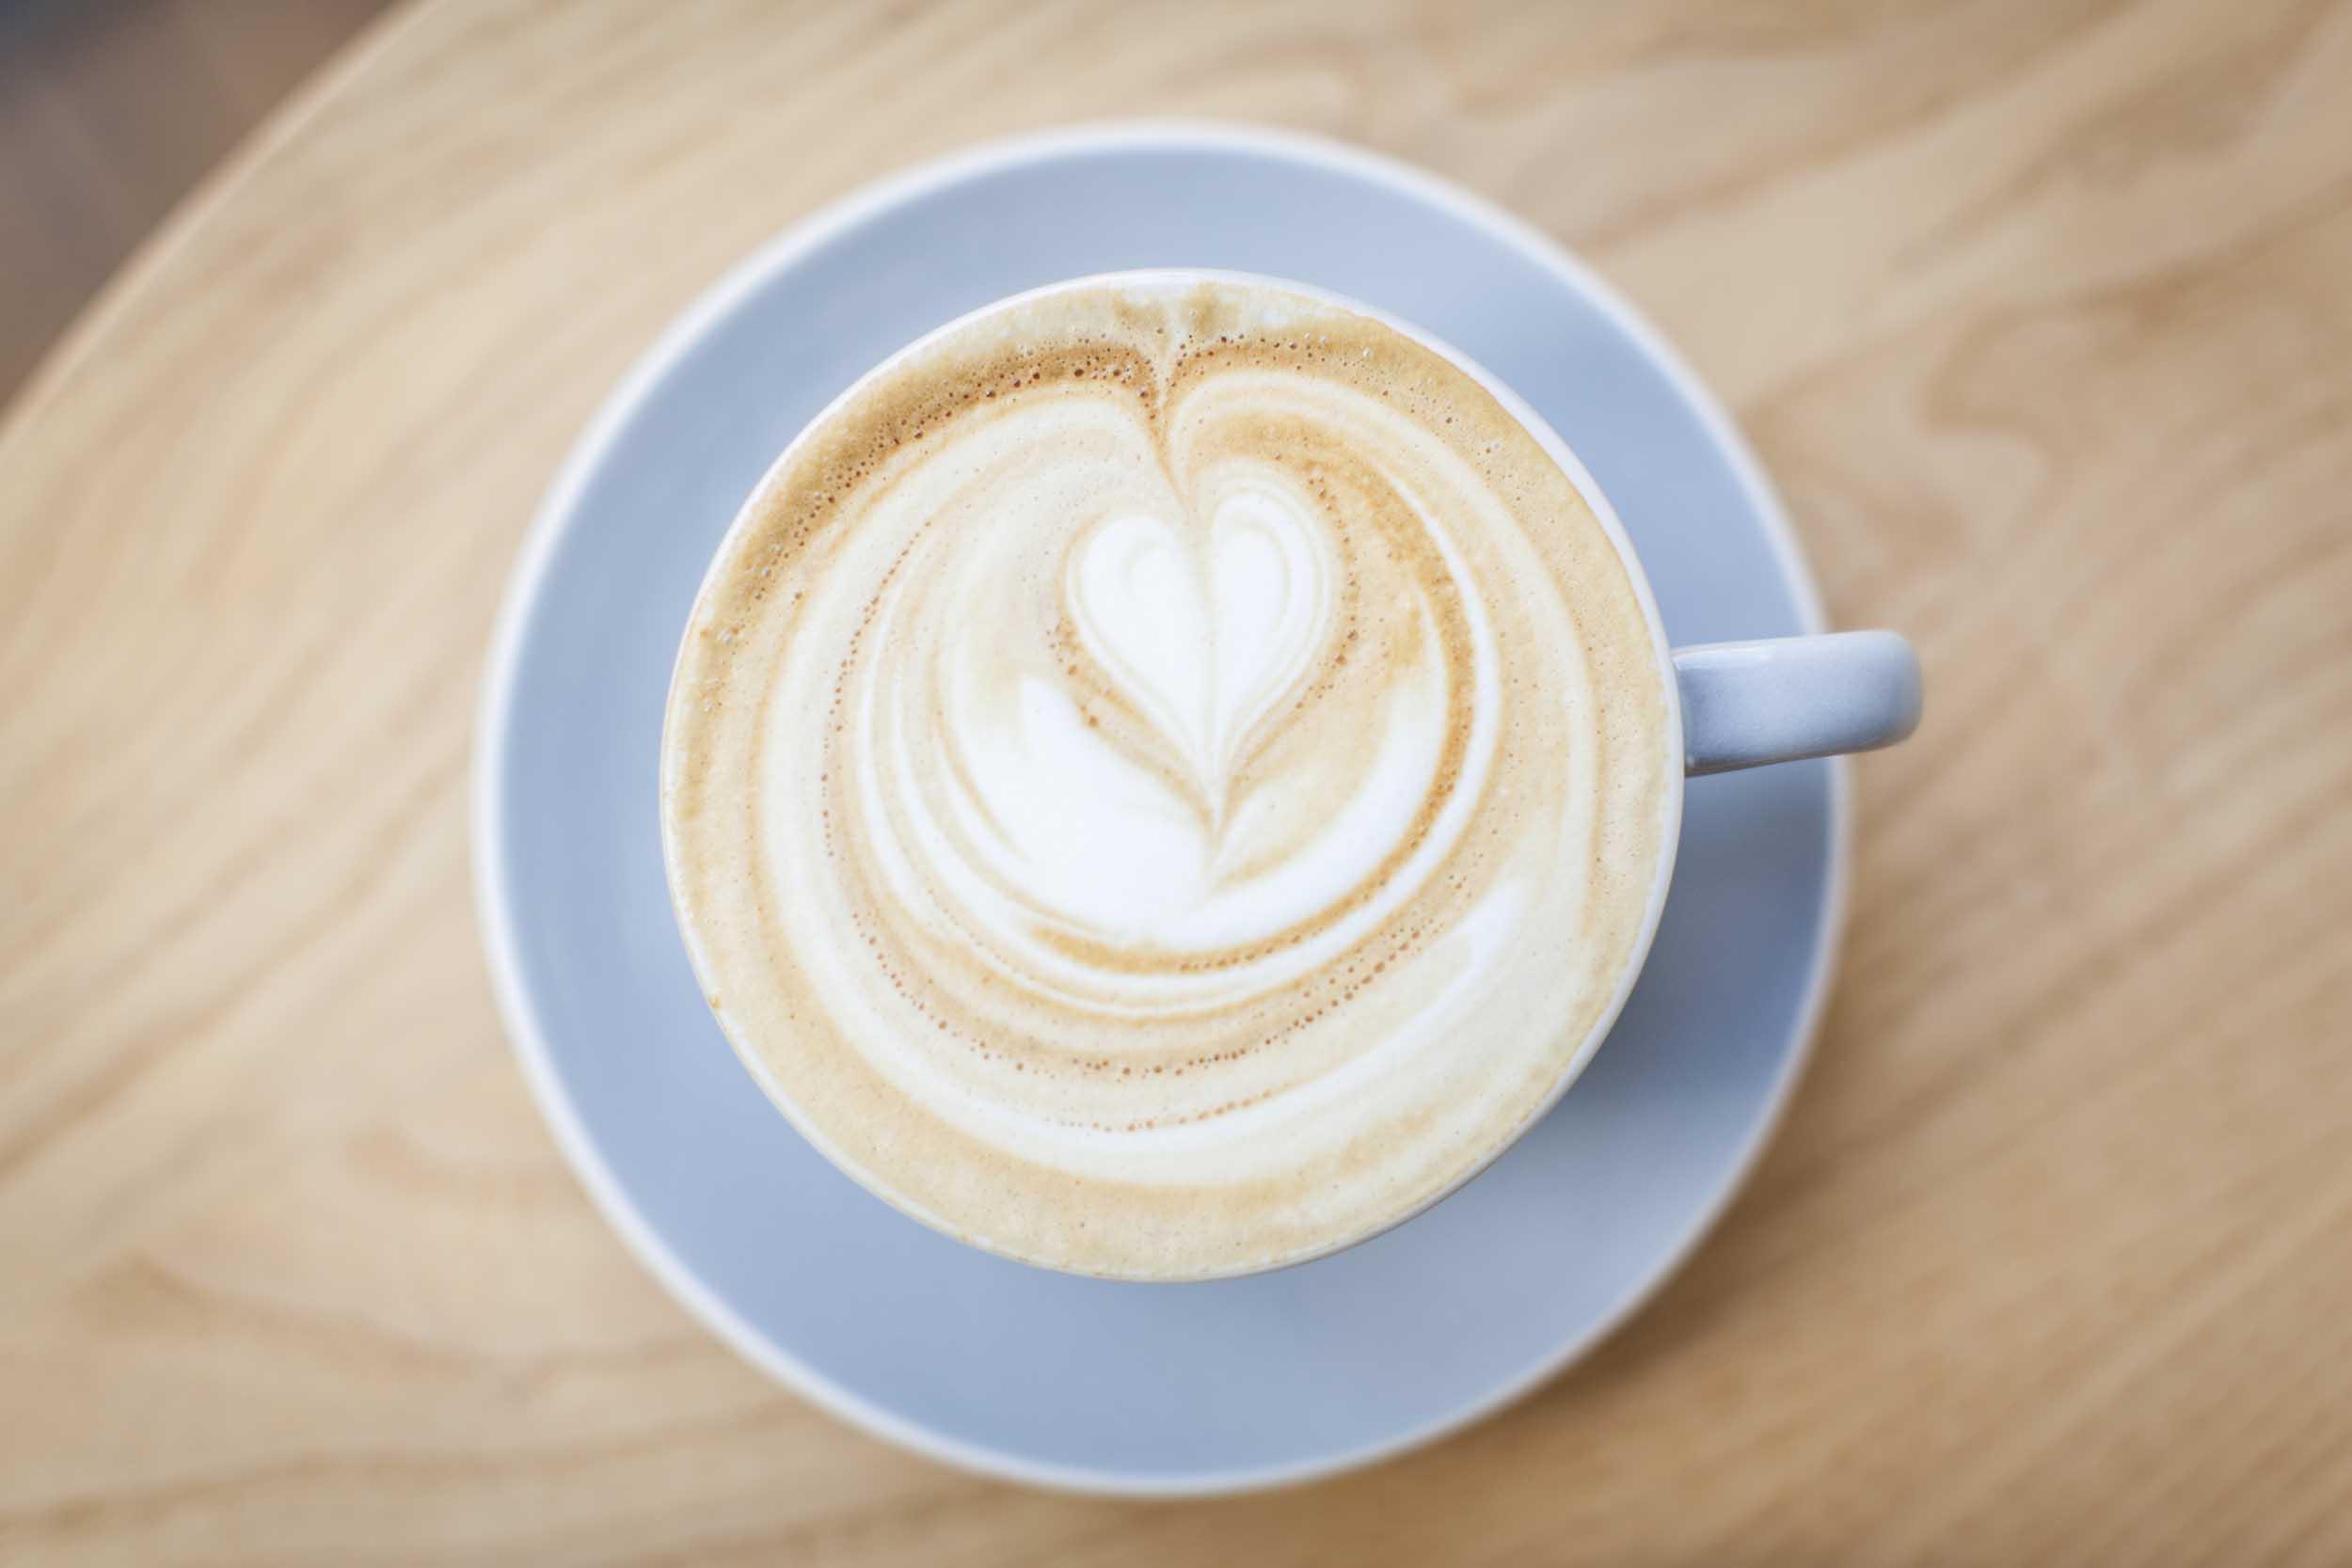 MB_Coffee_01_2500PX.jpg